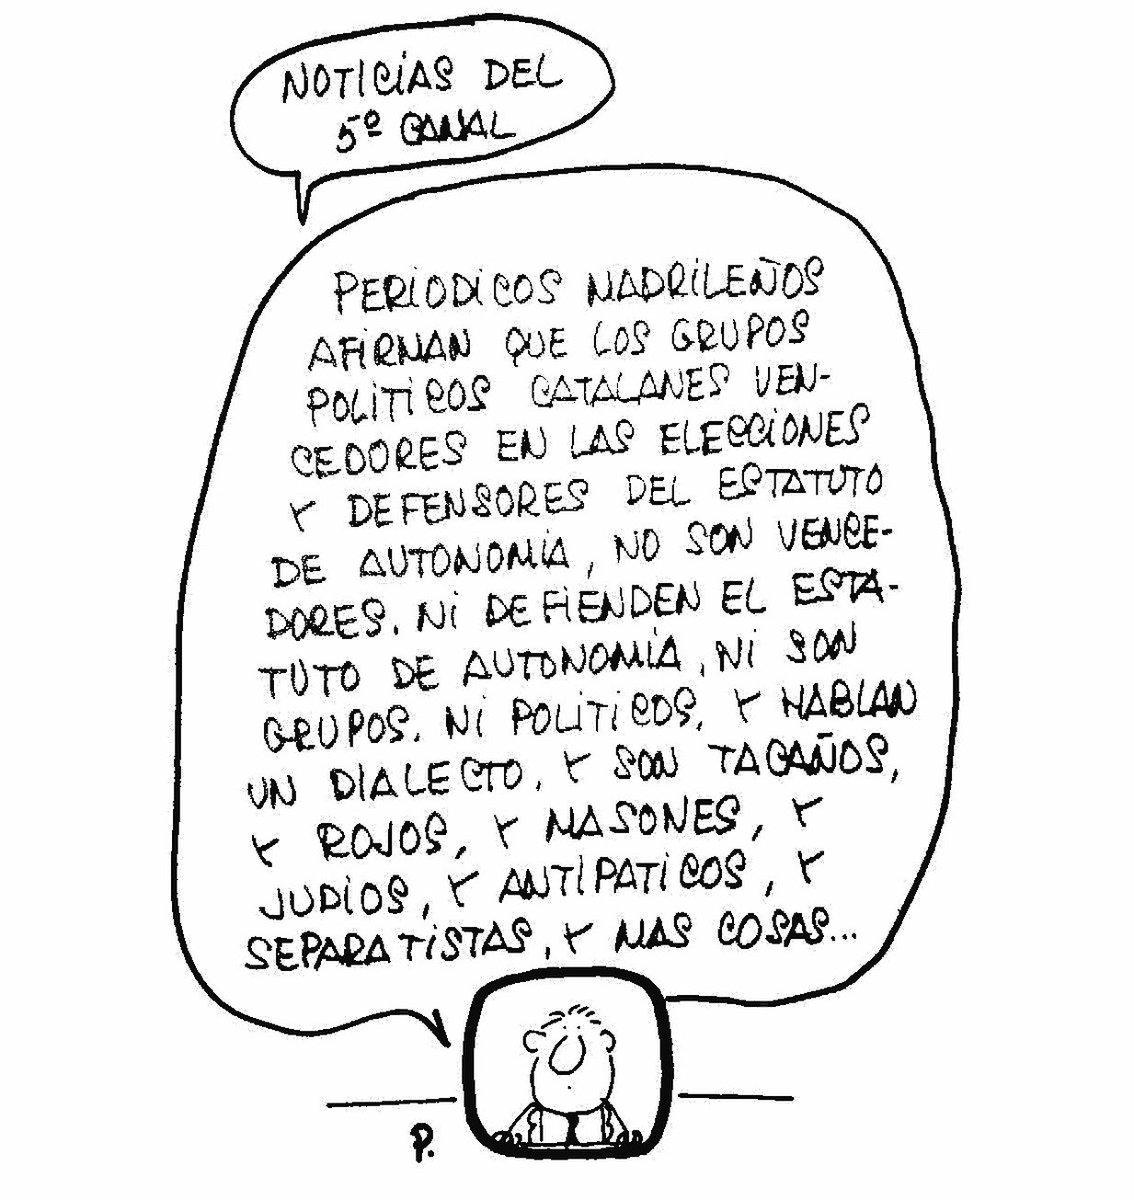 #Informa_como_Antena3 por ejemplo.